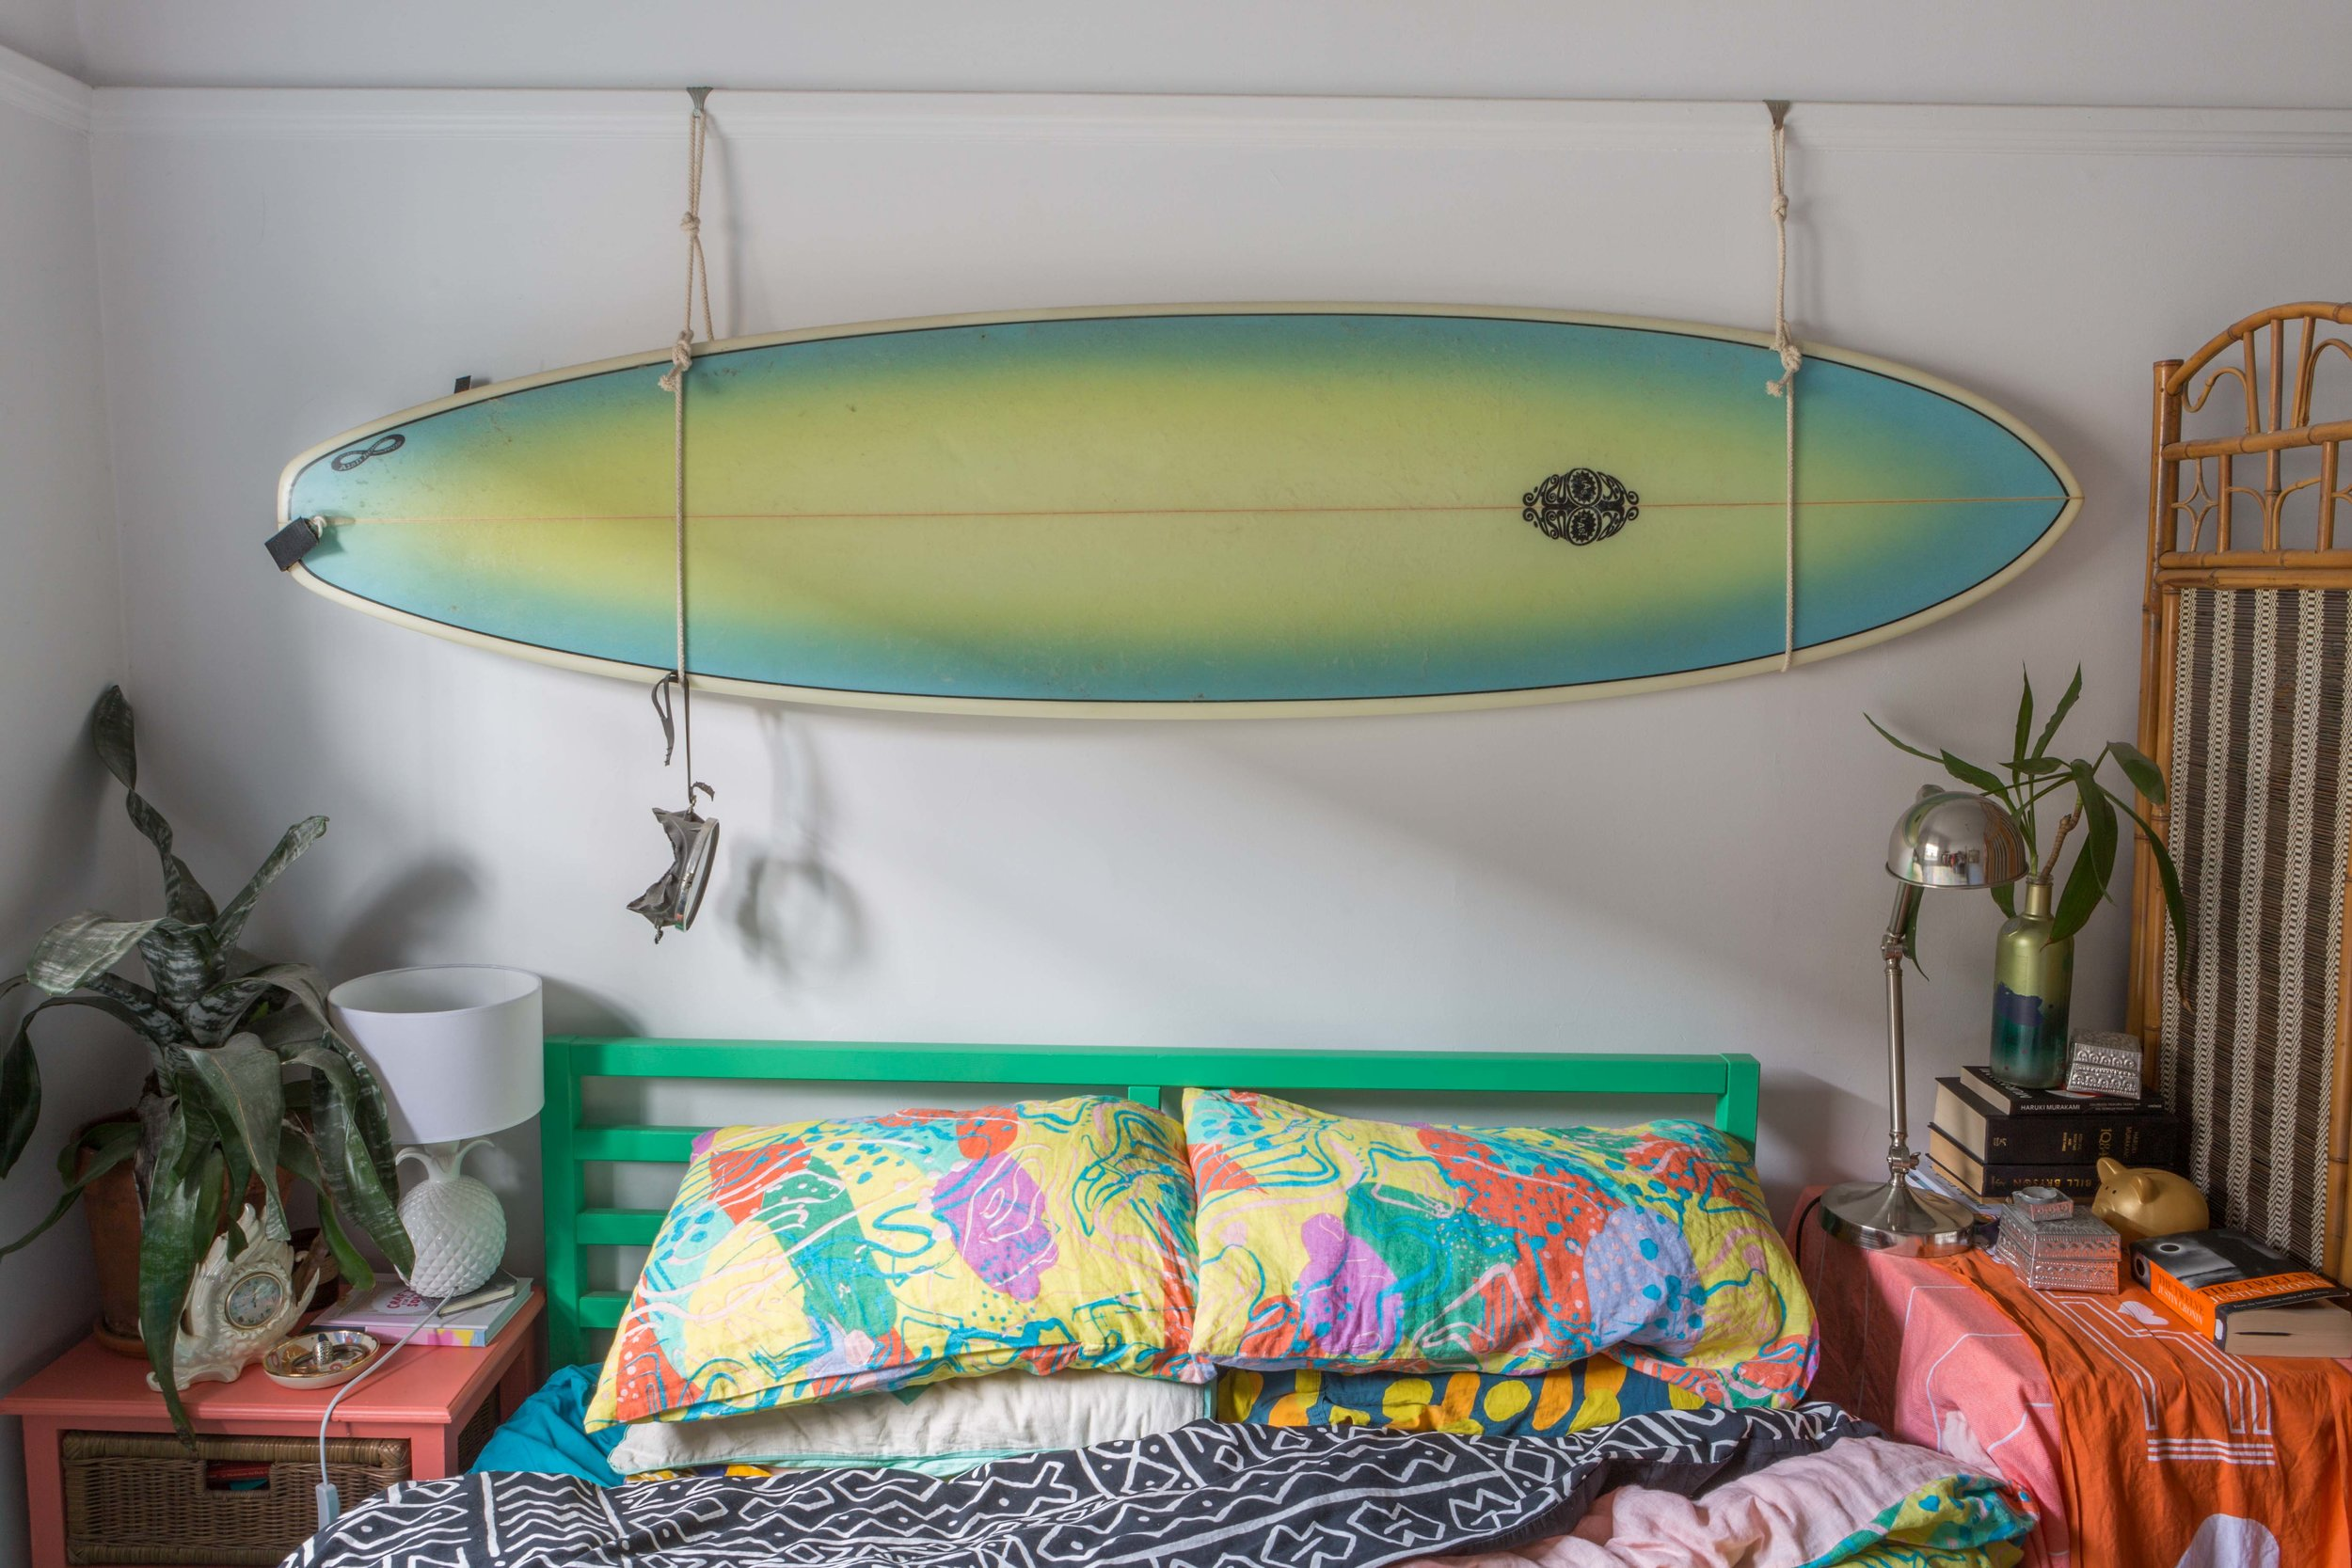 Miriam and Hamish McWilliam's home - Rented Space